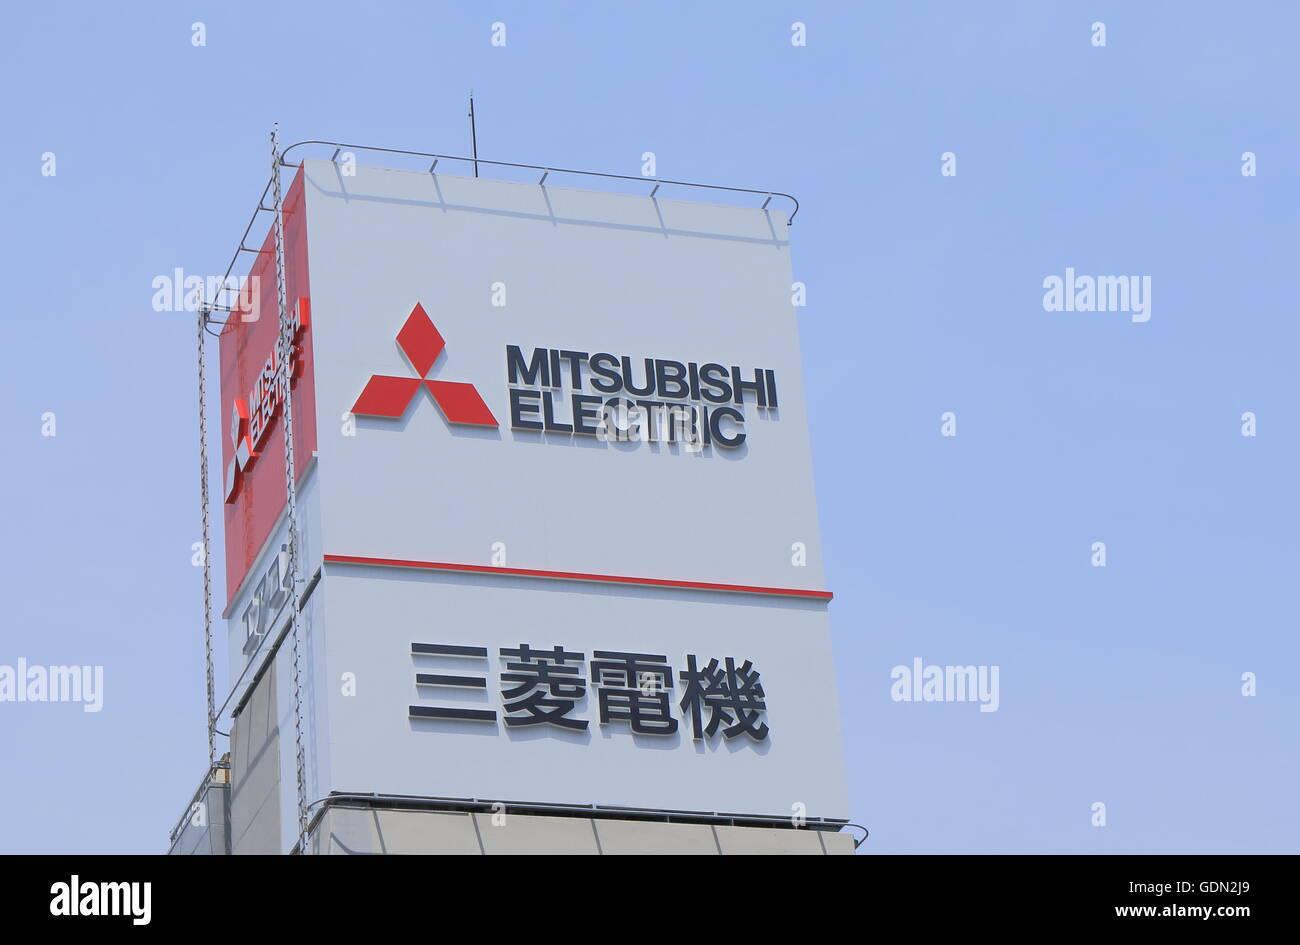 Mitsubishi Electric Company, Japanese multinational electronics and ...